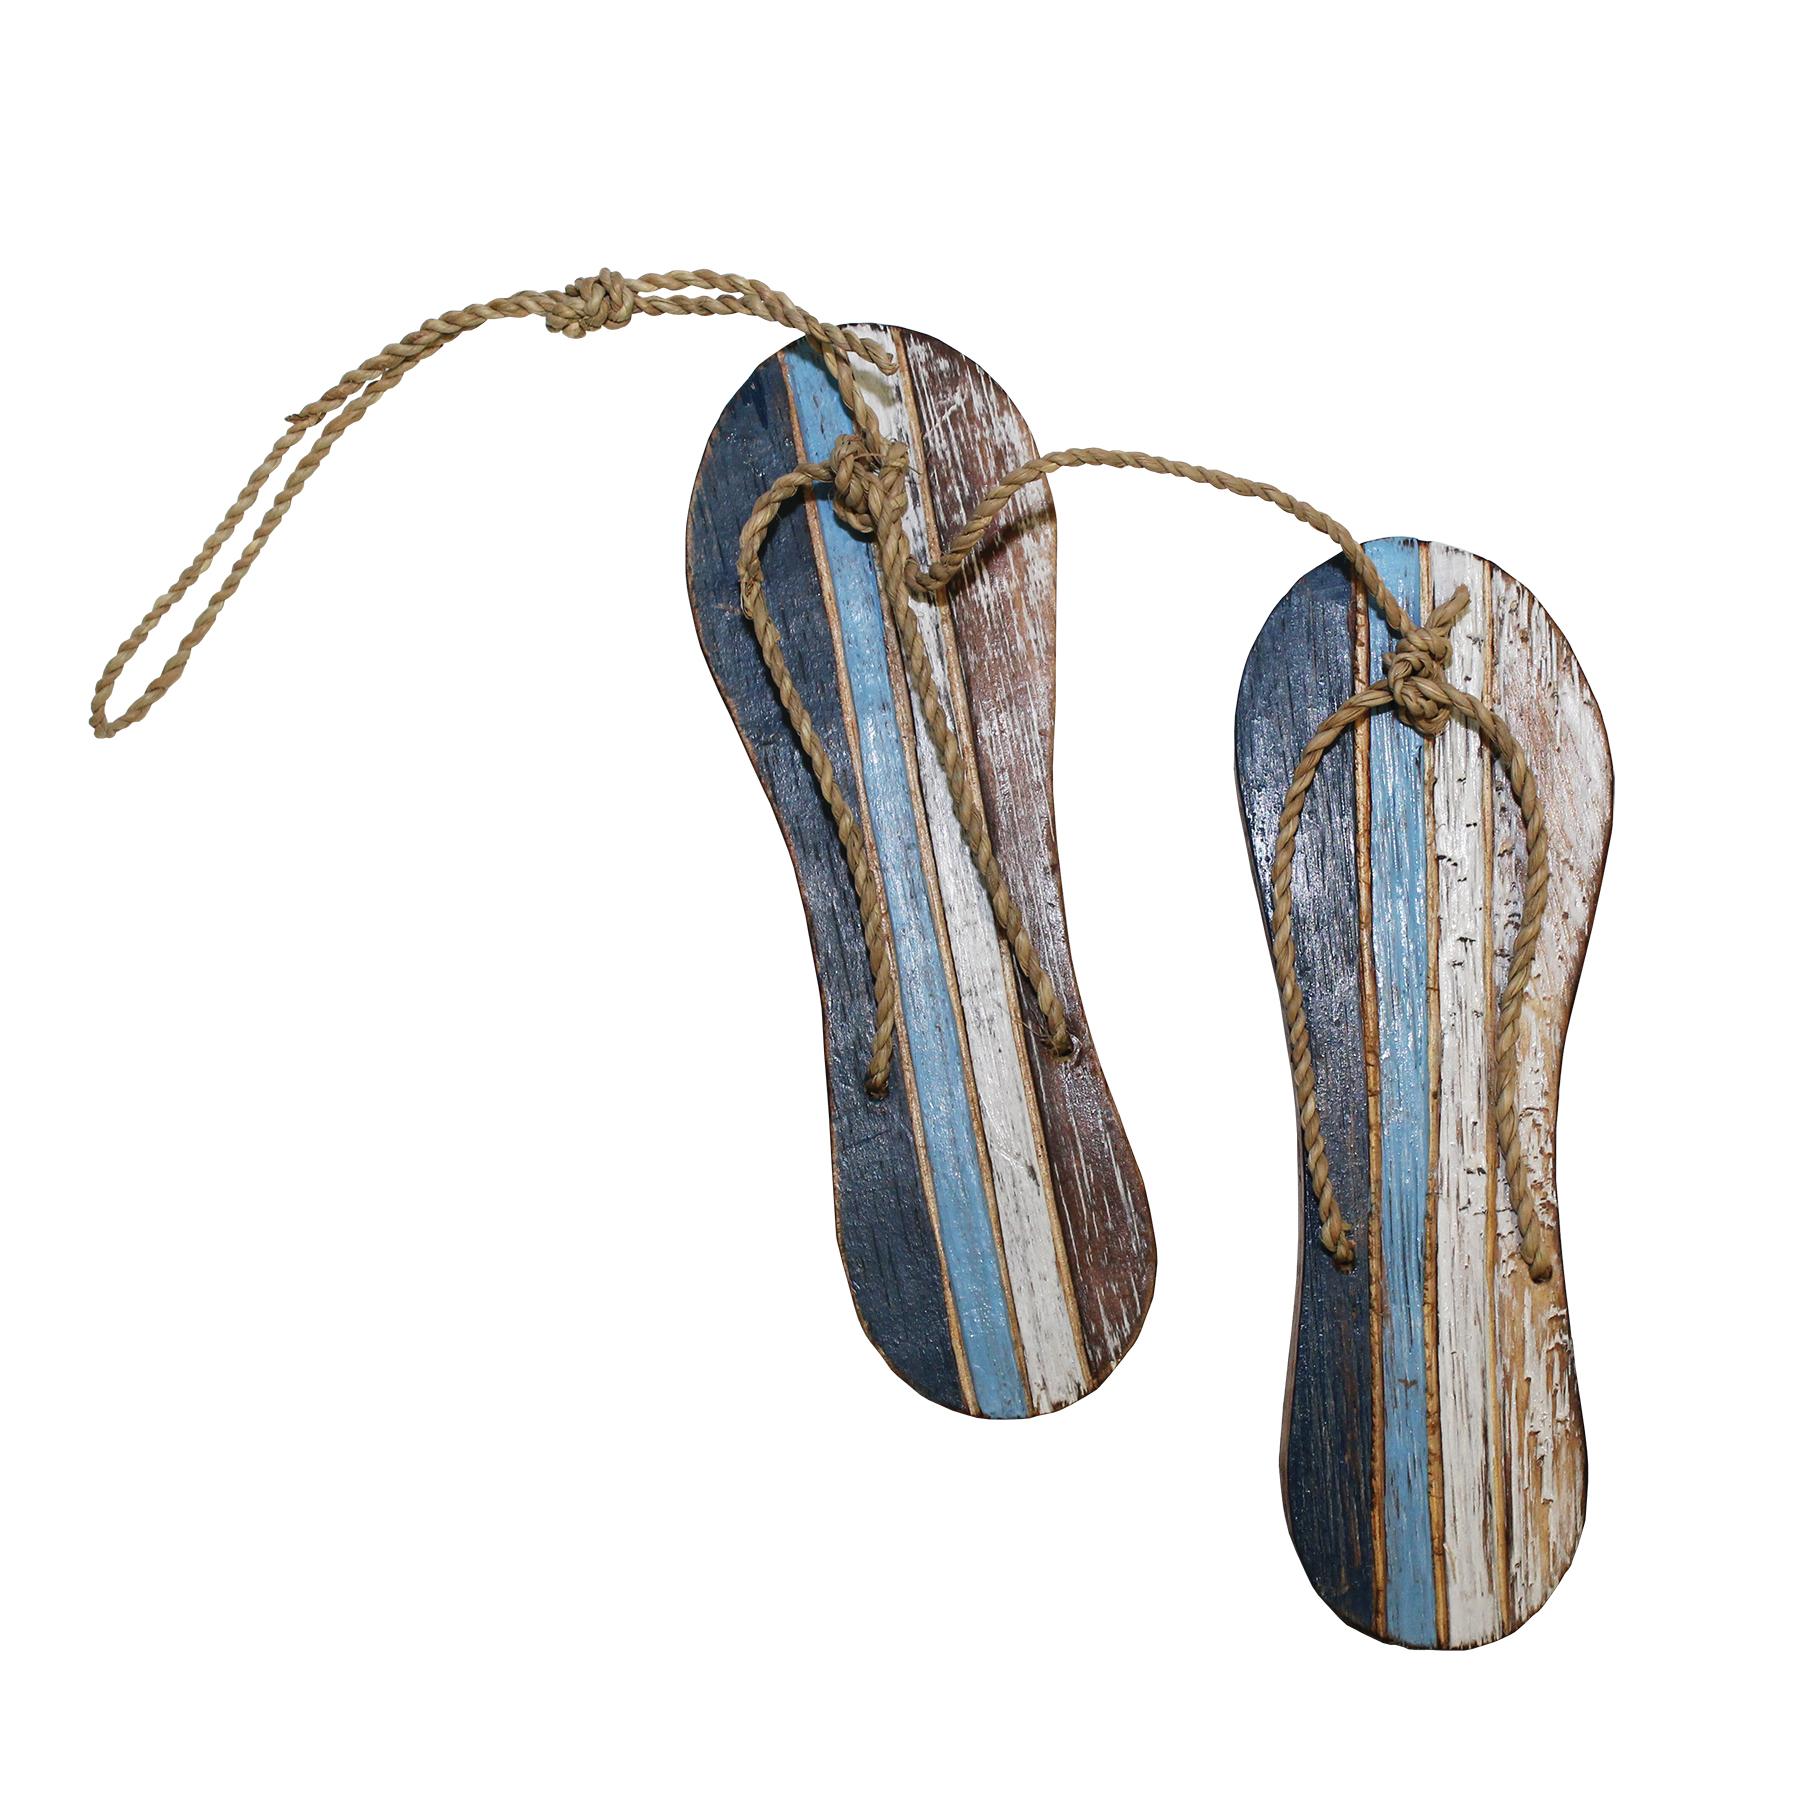 310S - Sandals Pair Striped